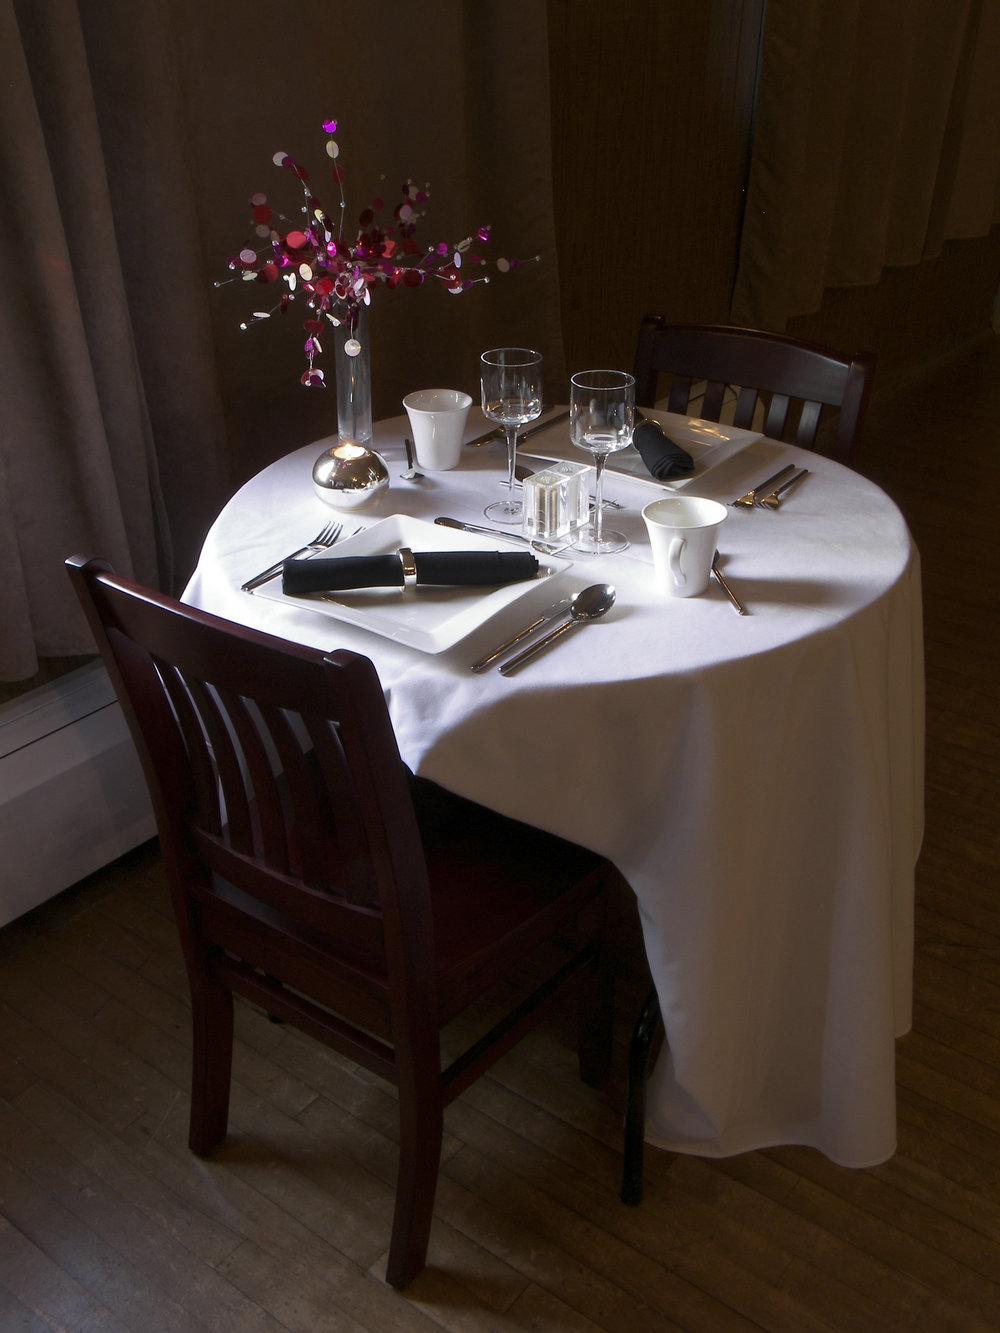 Copy of PRE-SHOW DINING